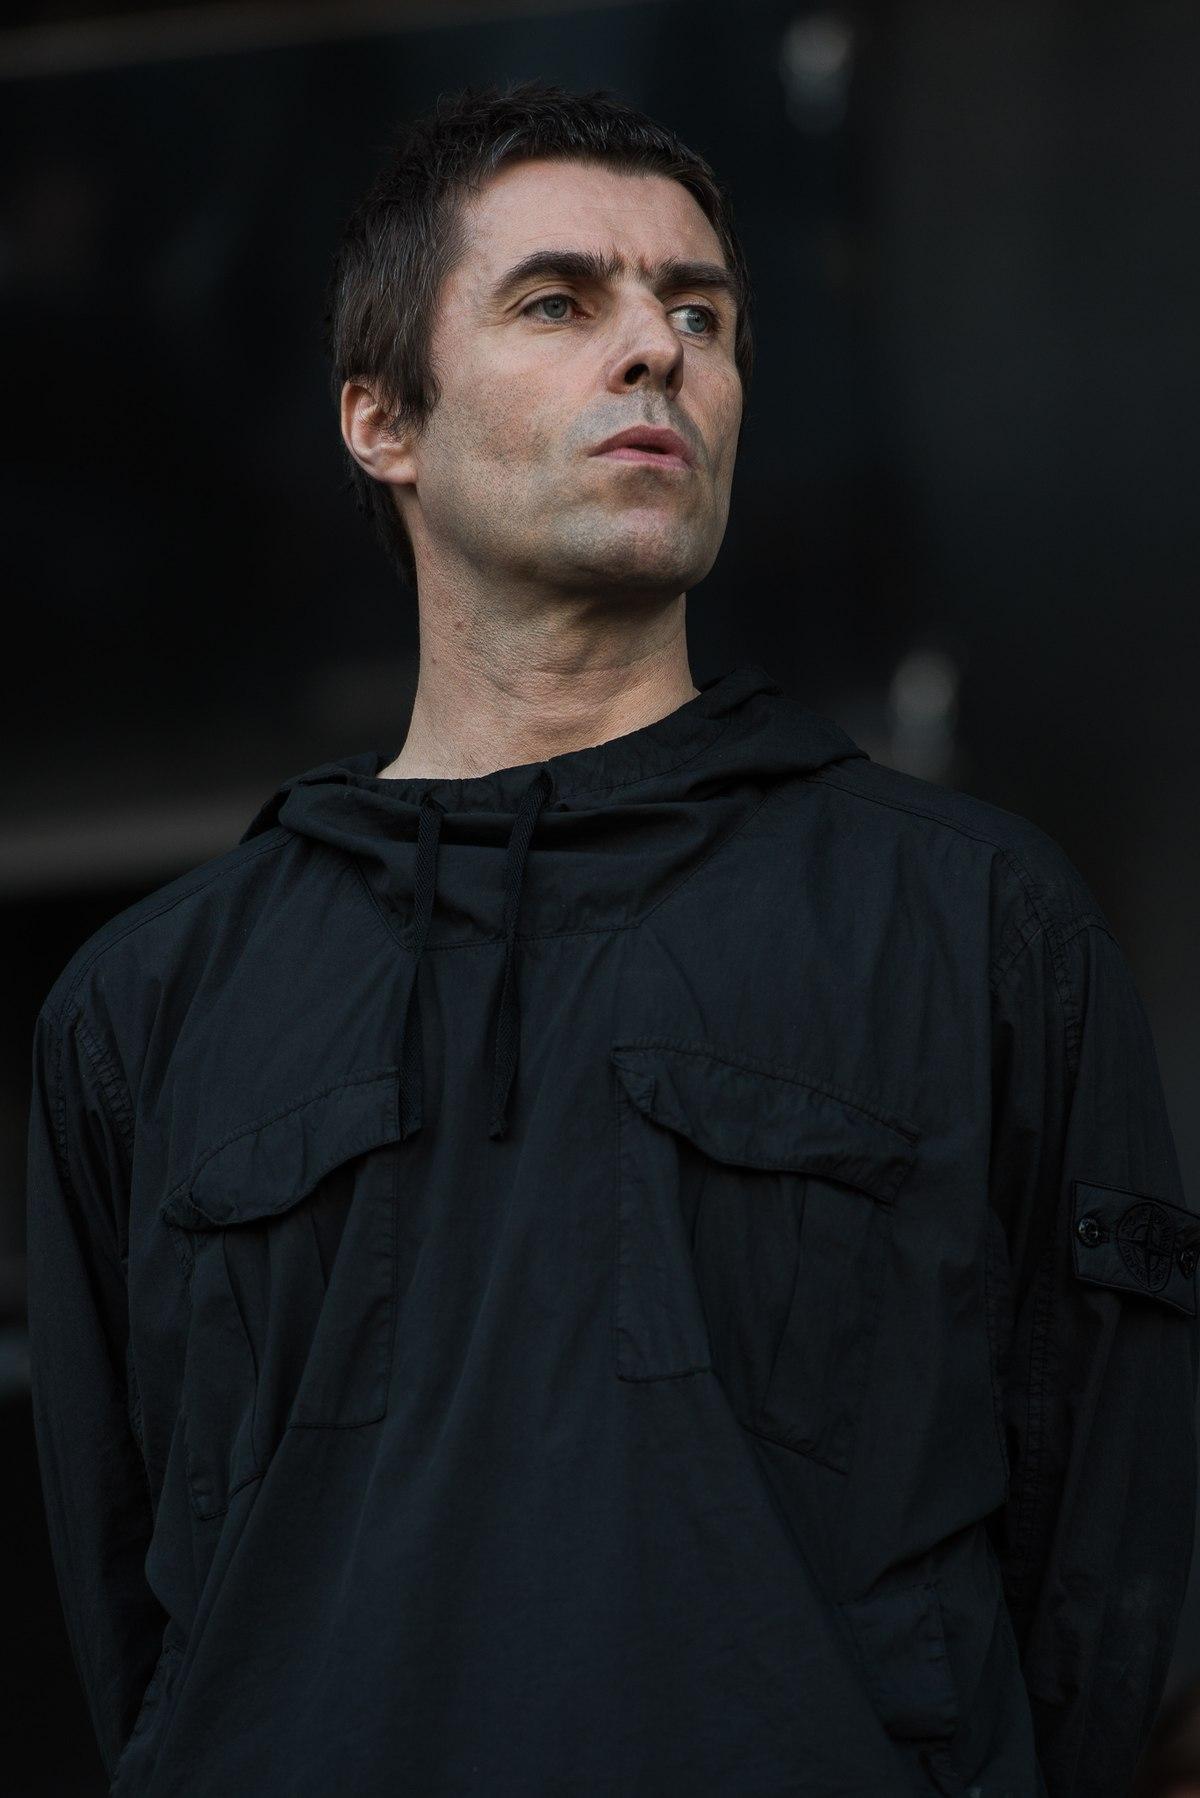 Foto de Liam Gallagher  número 86814